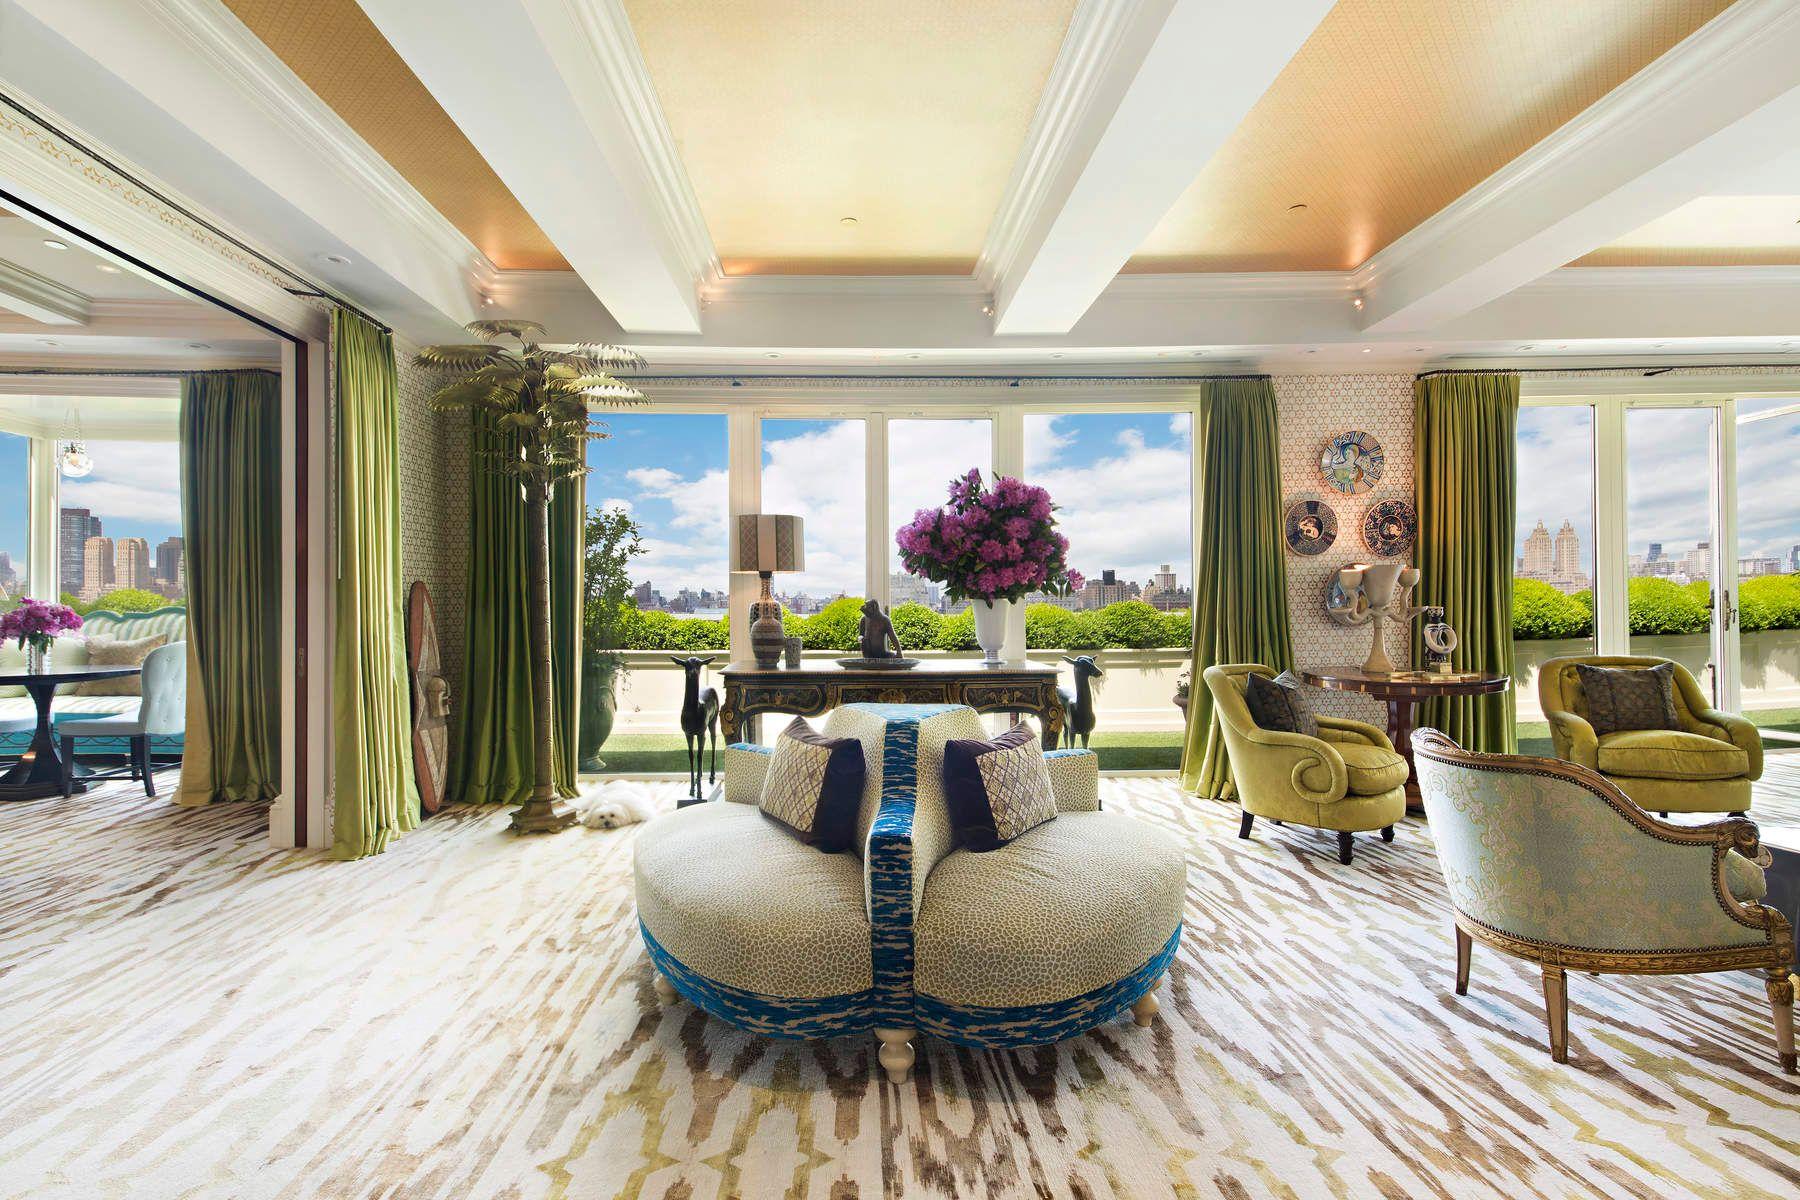 Apartments для того Продажа на Stanhope Penthouse 995 Fifth Avenue, PH, New York, Нью-Йорк 10028 Соединенные Штаты